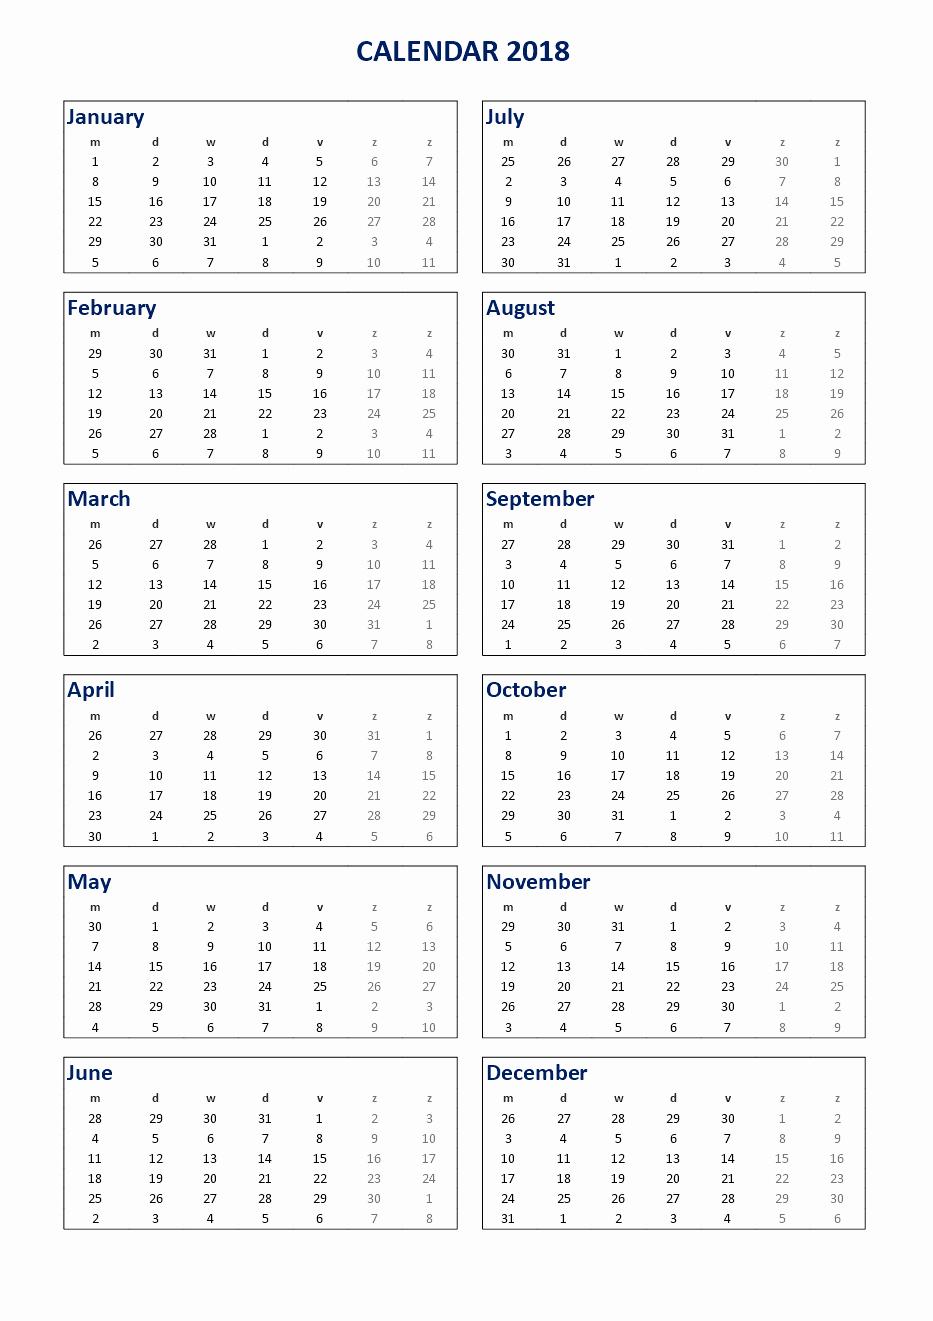 Microsoft Word 2018 Calendar Templates Awesome Free 2018 Printable Calendar 2018 Ms Word Template